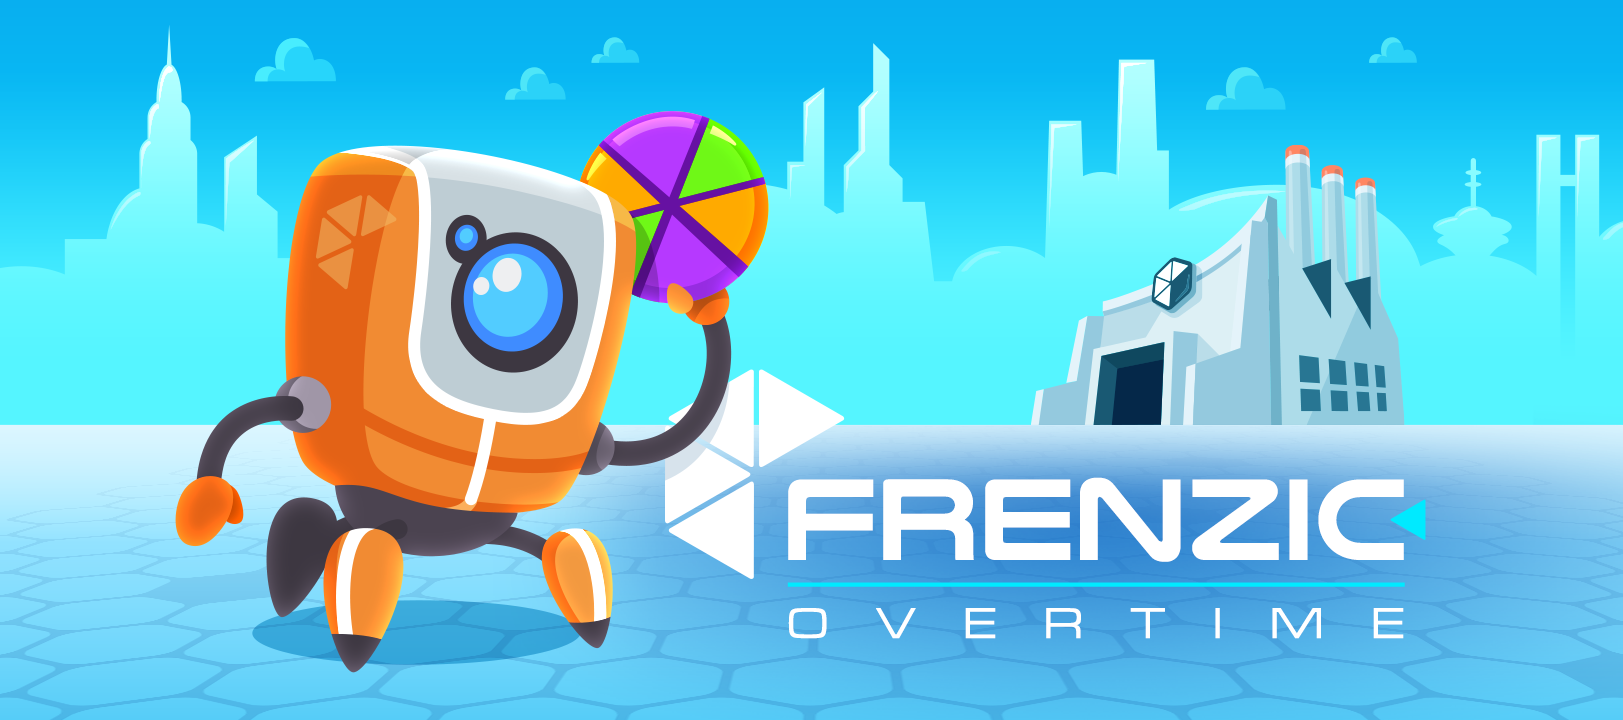 Frenzic: Overtime hero image of DoBot standing outside Frenzic Industries holding a powercore